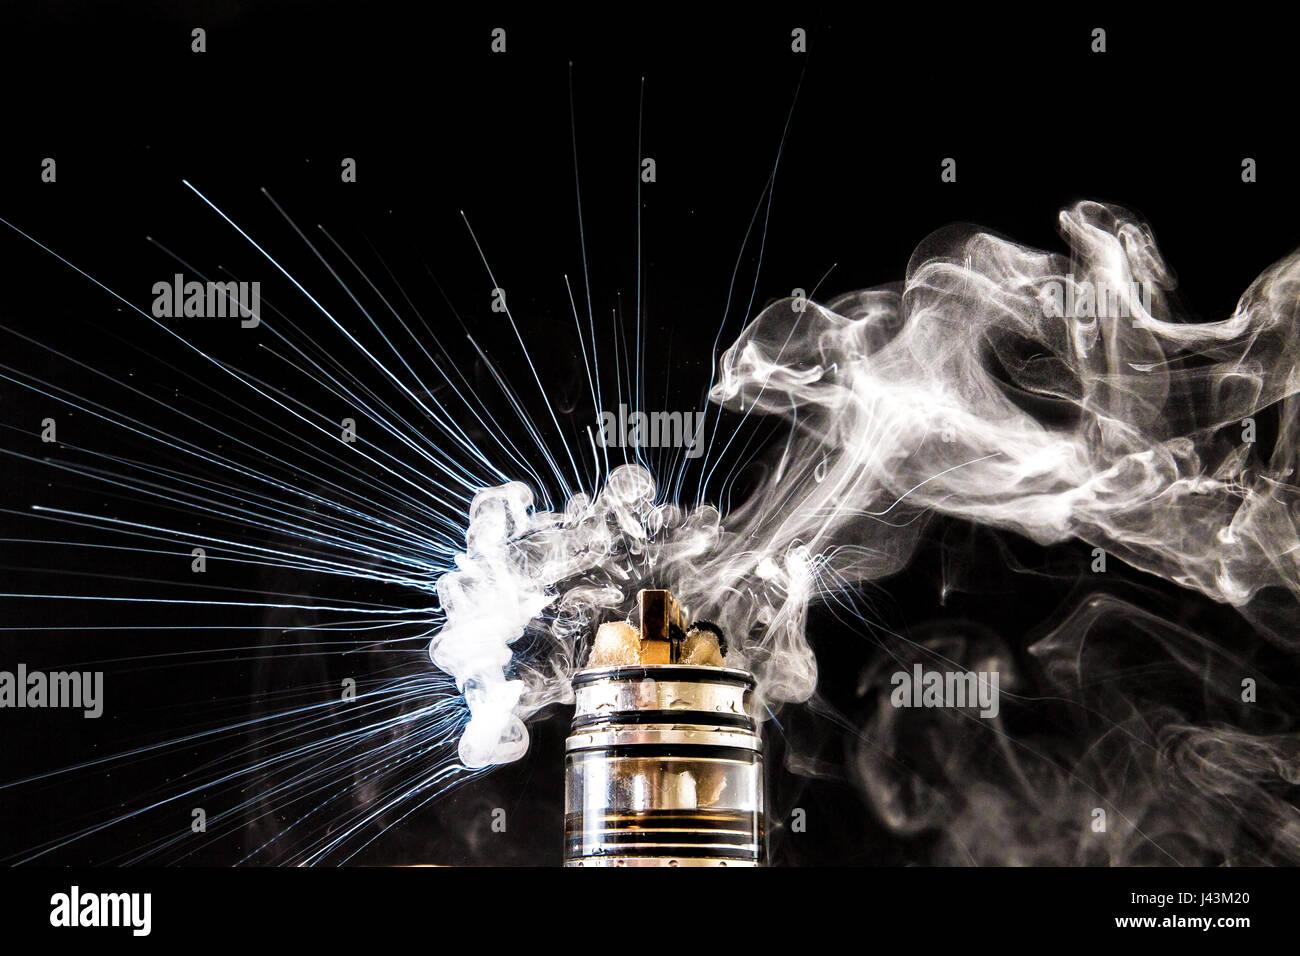 Dissassembled electronic Cigarette vape explosion - Stock Image